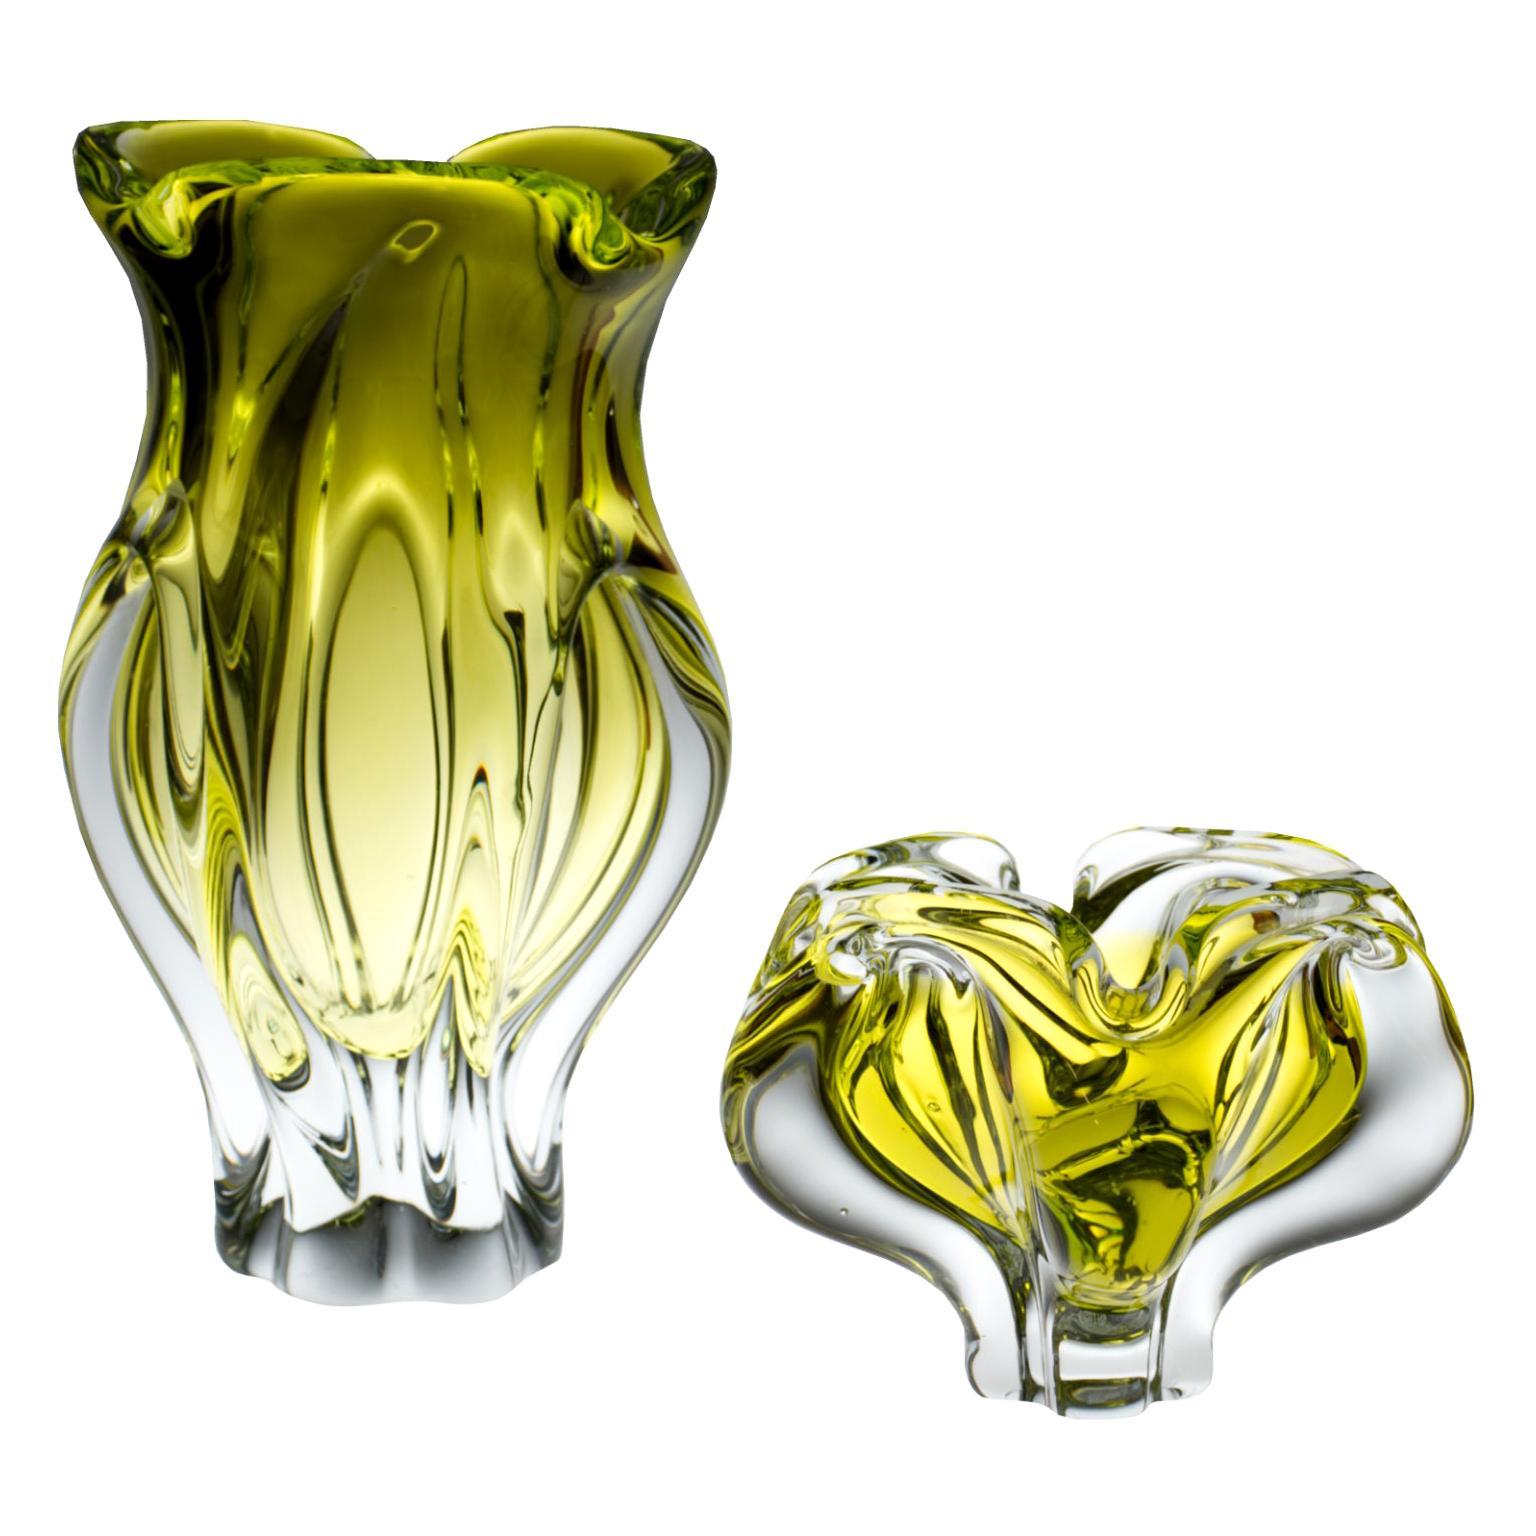 Bohemian Art Glass Vase and Ashtray by Josef Hospodka, Chribska Glasswork, 1960s